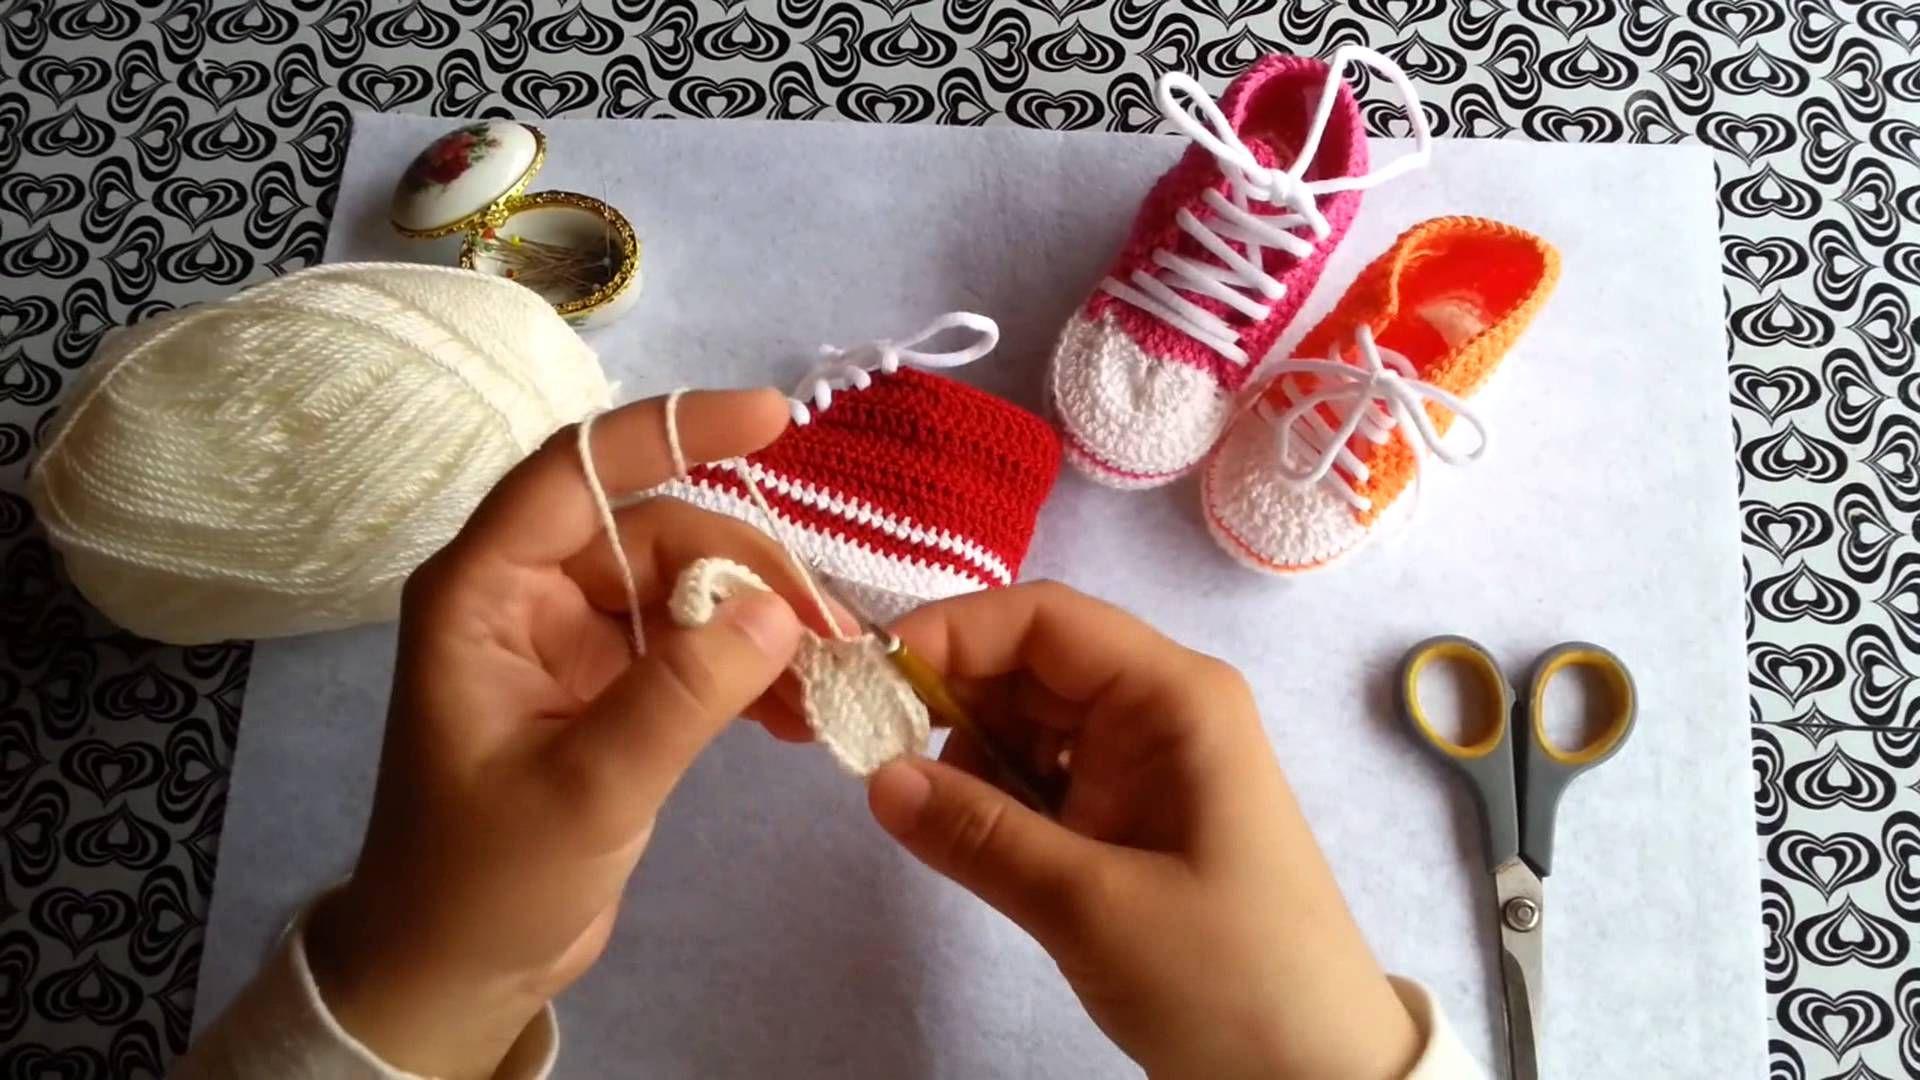 Converse Bebek Patik Yapımı (8) | Bebek patik, Bebek, Converse | 1080x1920